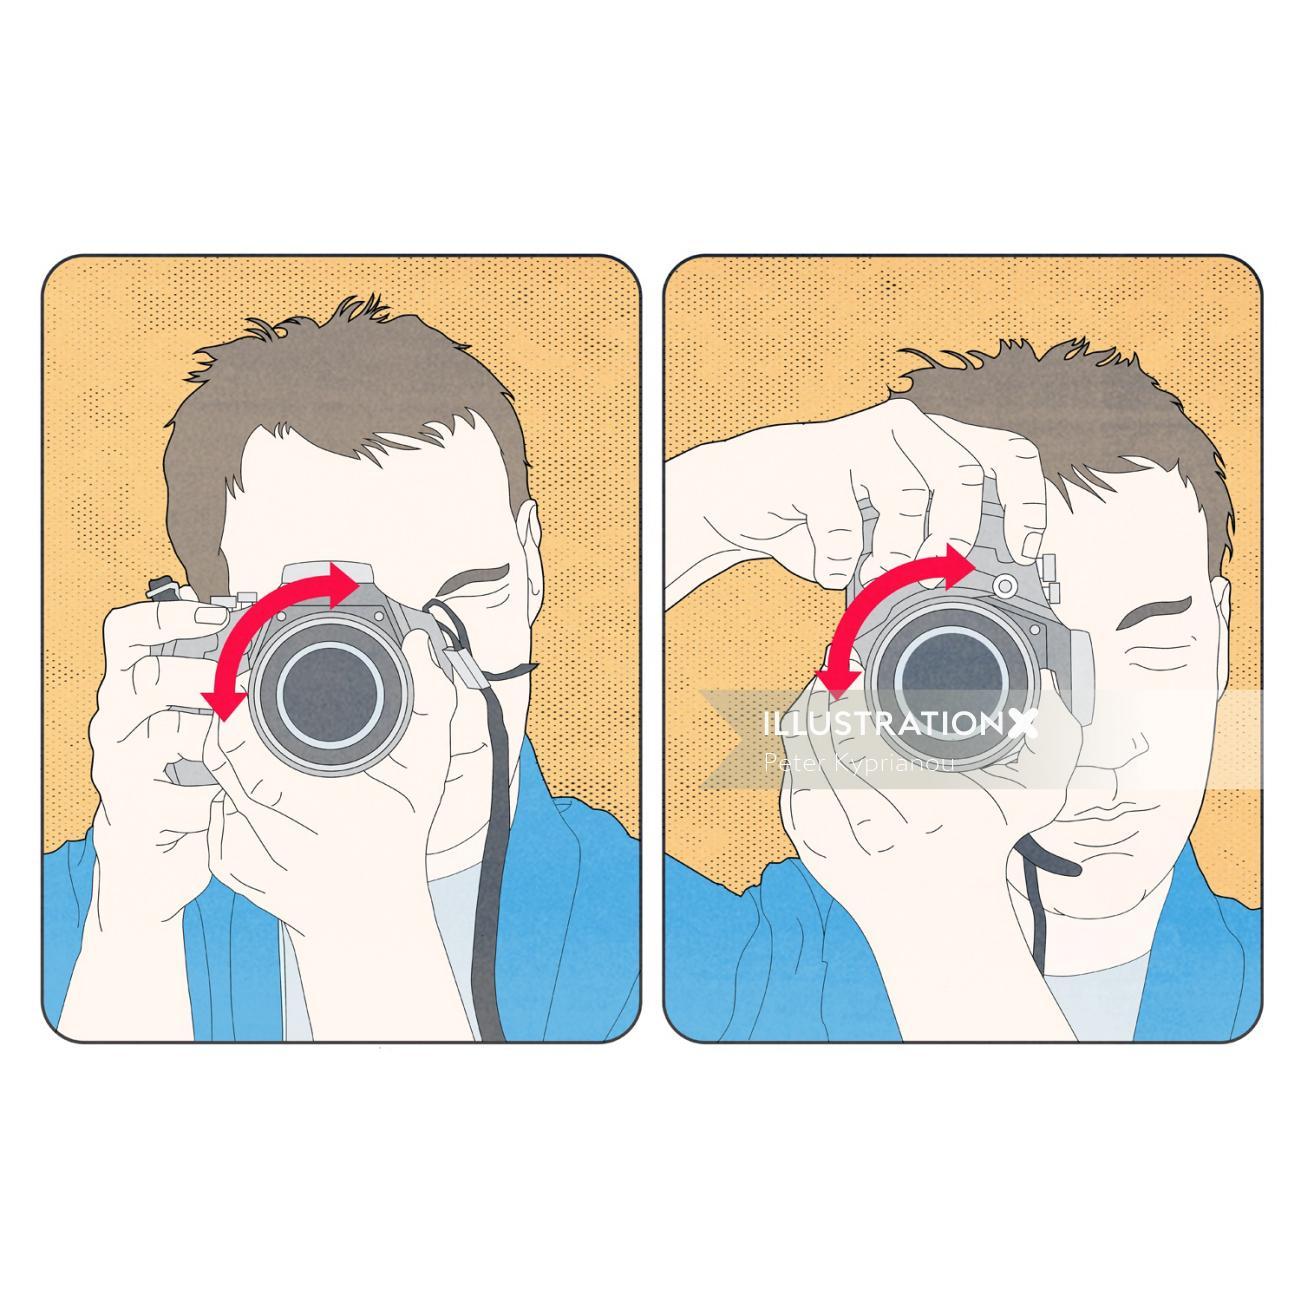 Infographic of Photographer